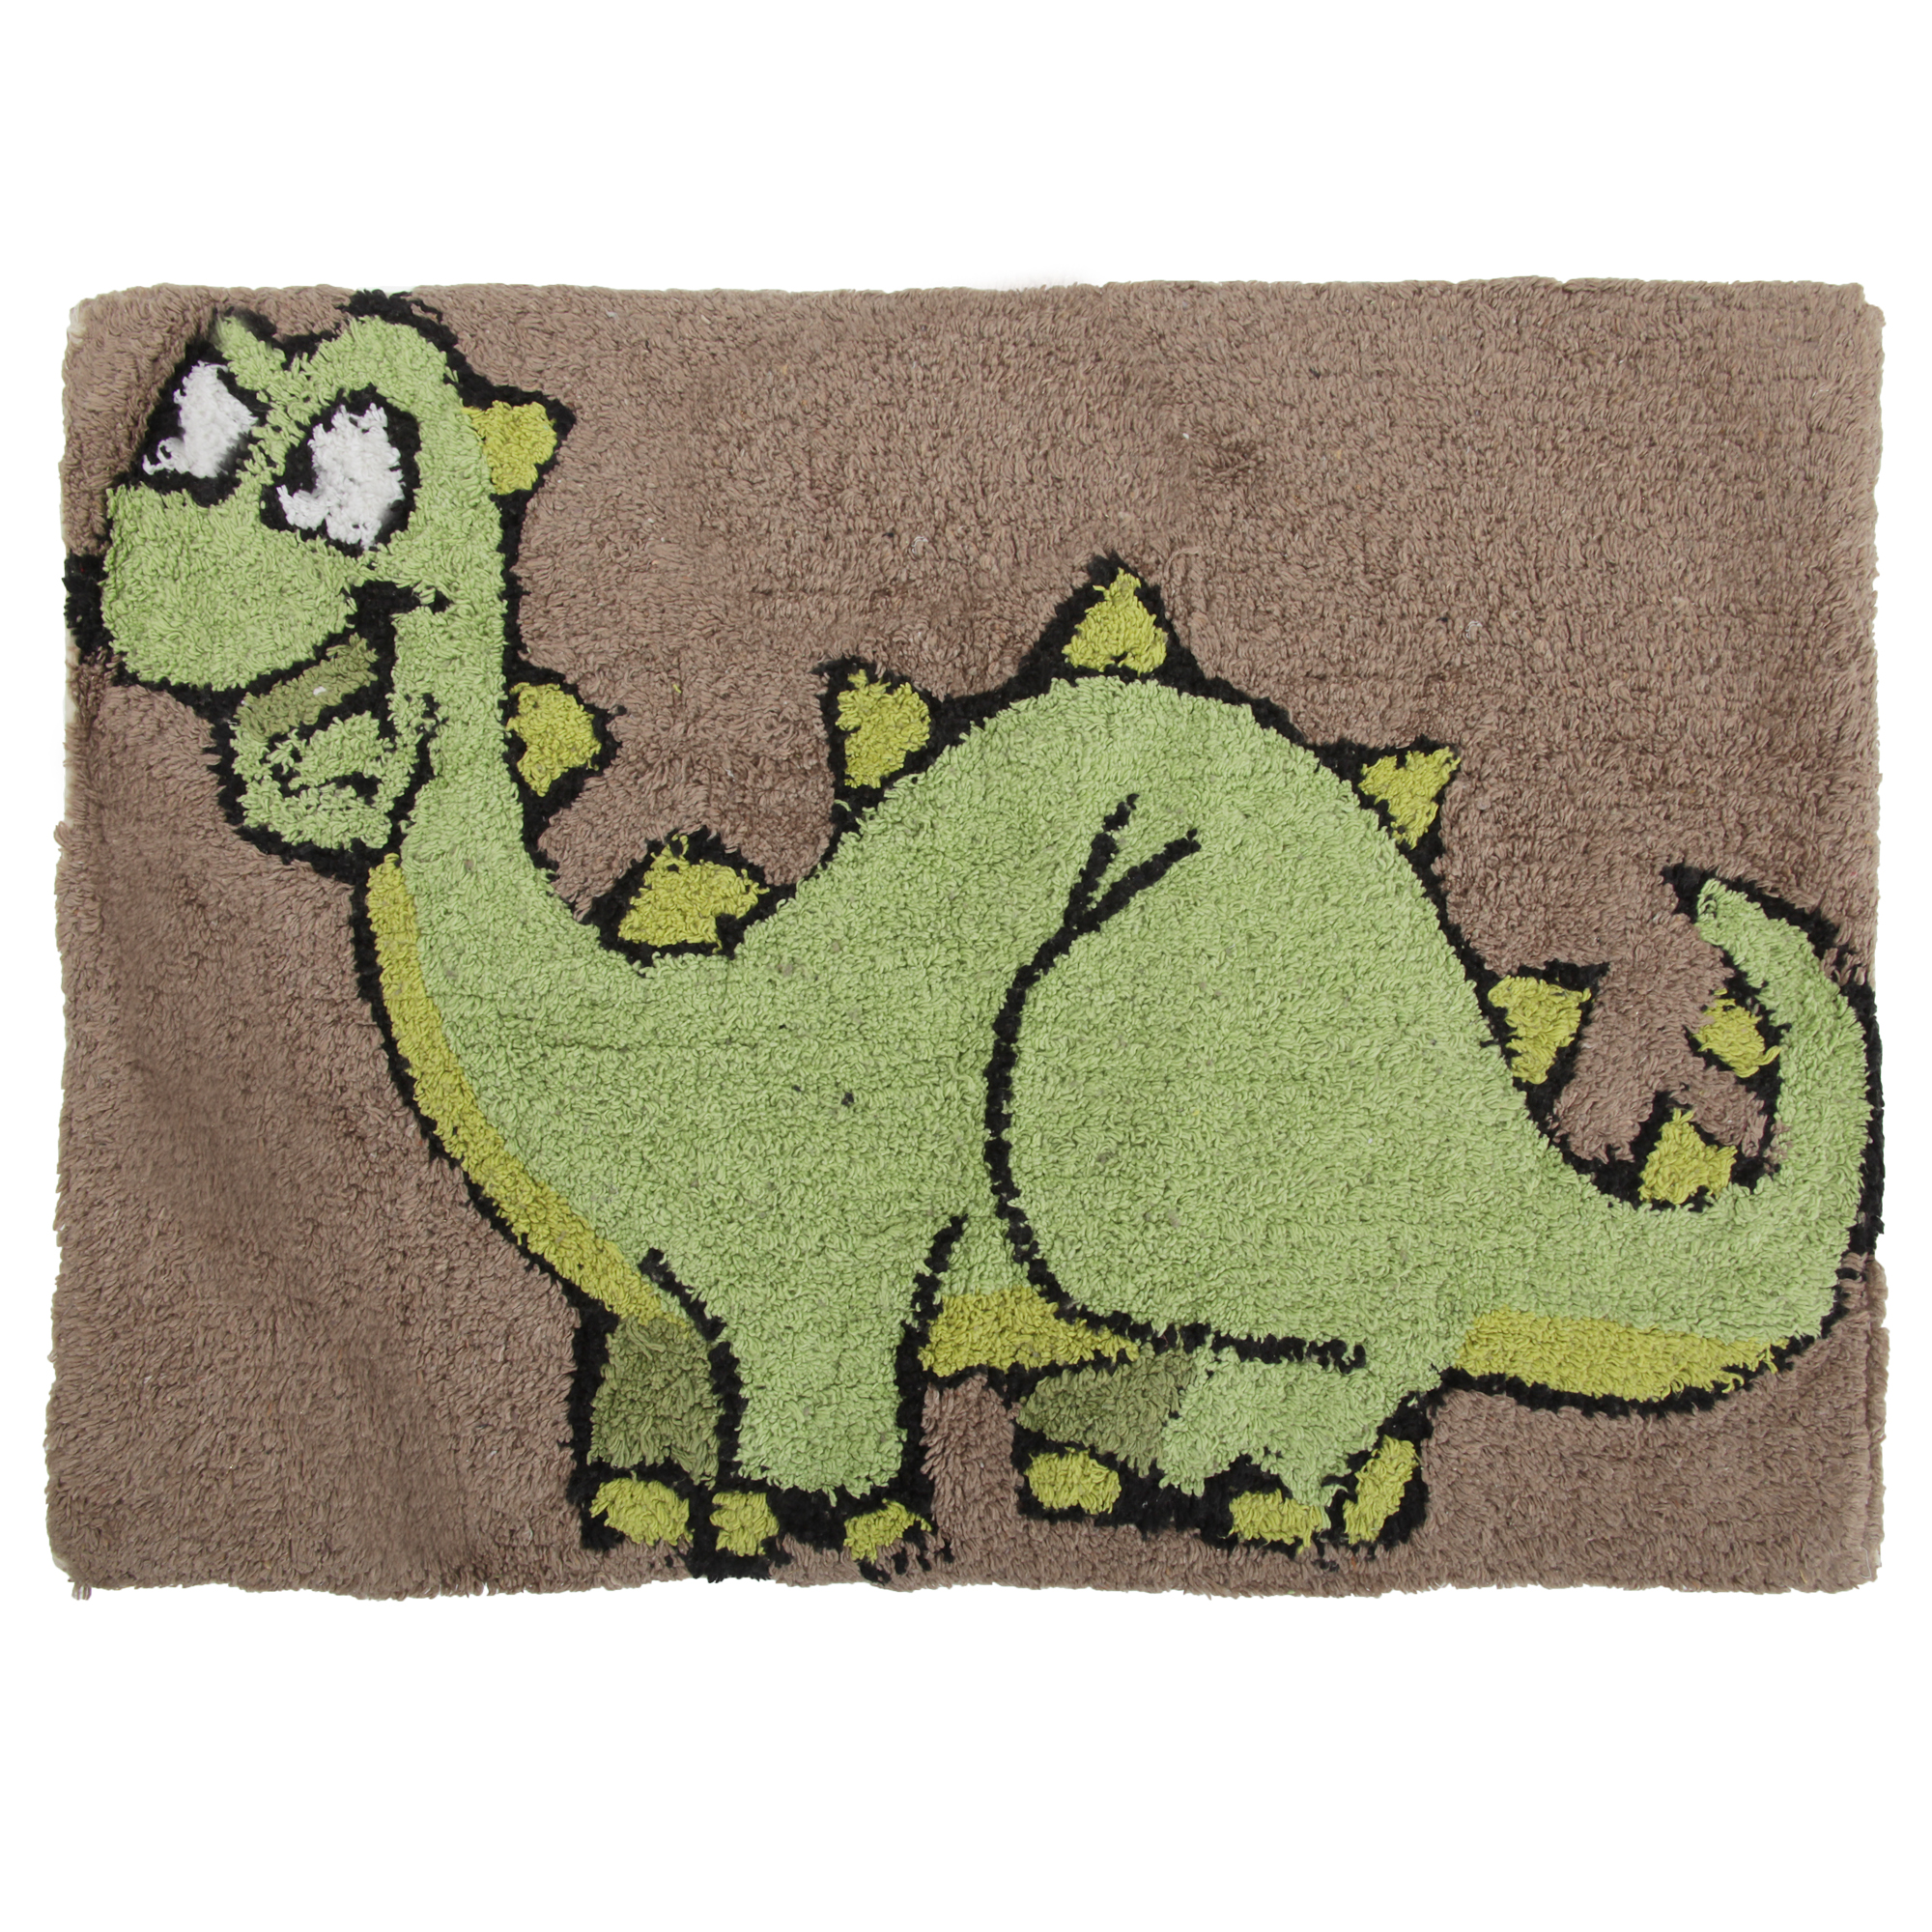 Play Rug Boys Football Pitch Childrens Rug Green: Mucky Fingers Childrens Boys Dinosaur Design Bedroom Floor